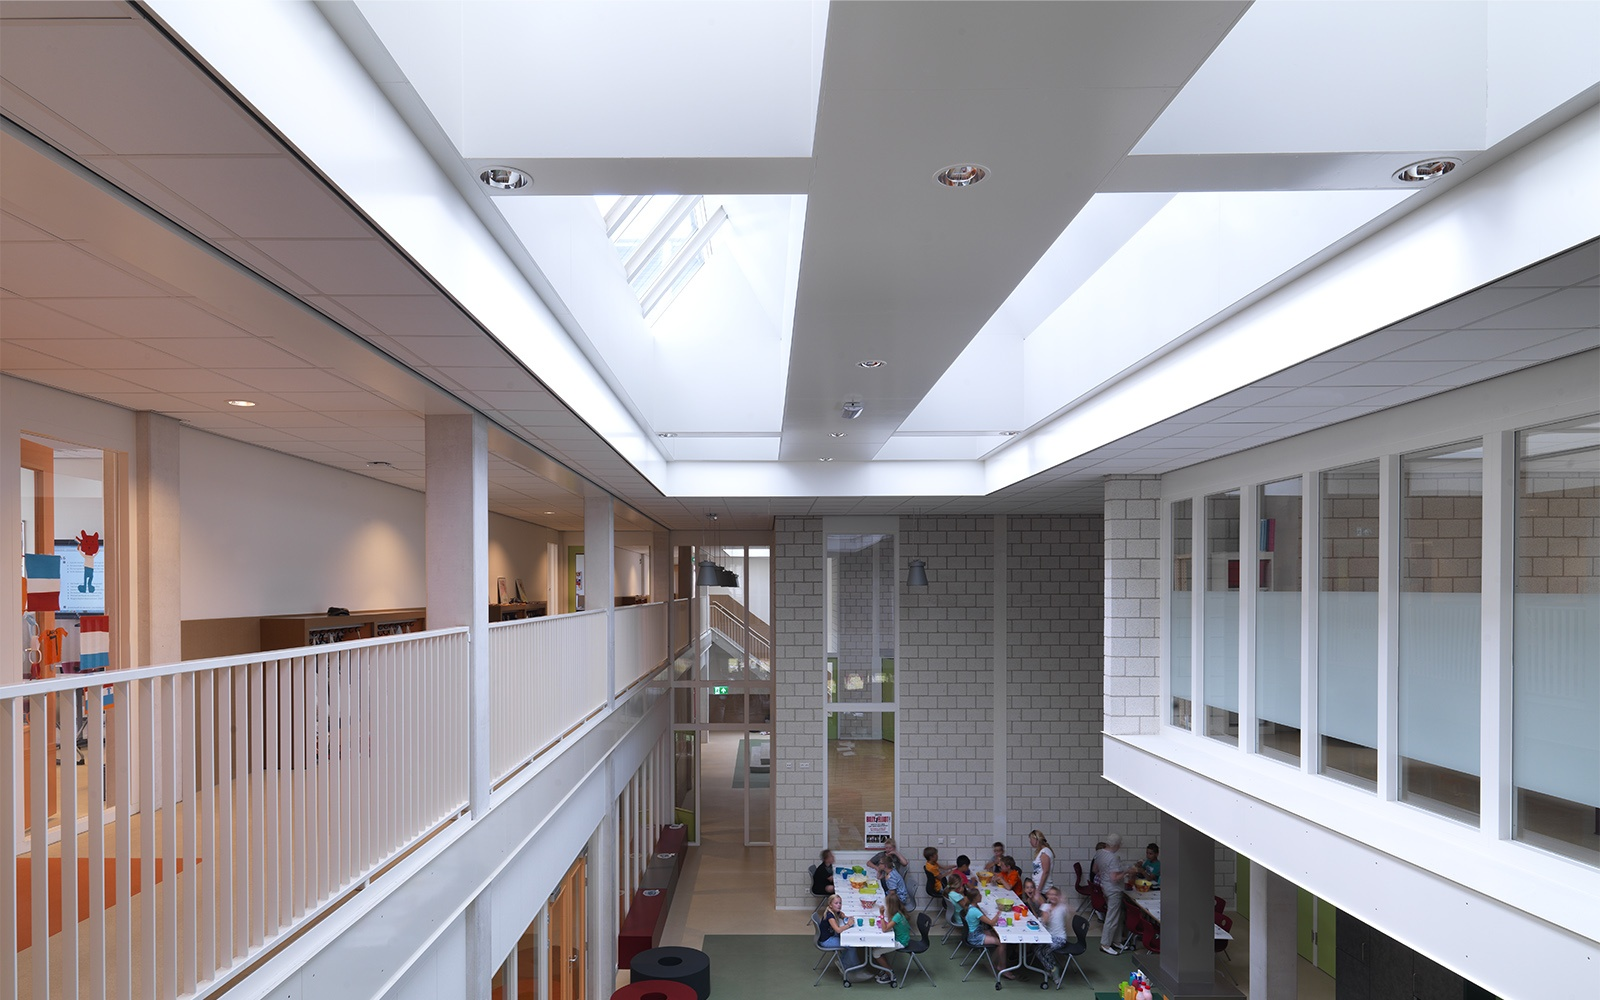 Ventilation architecture in school buildings